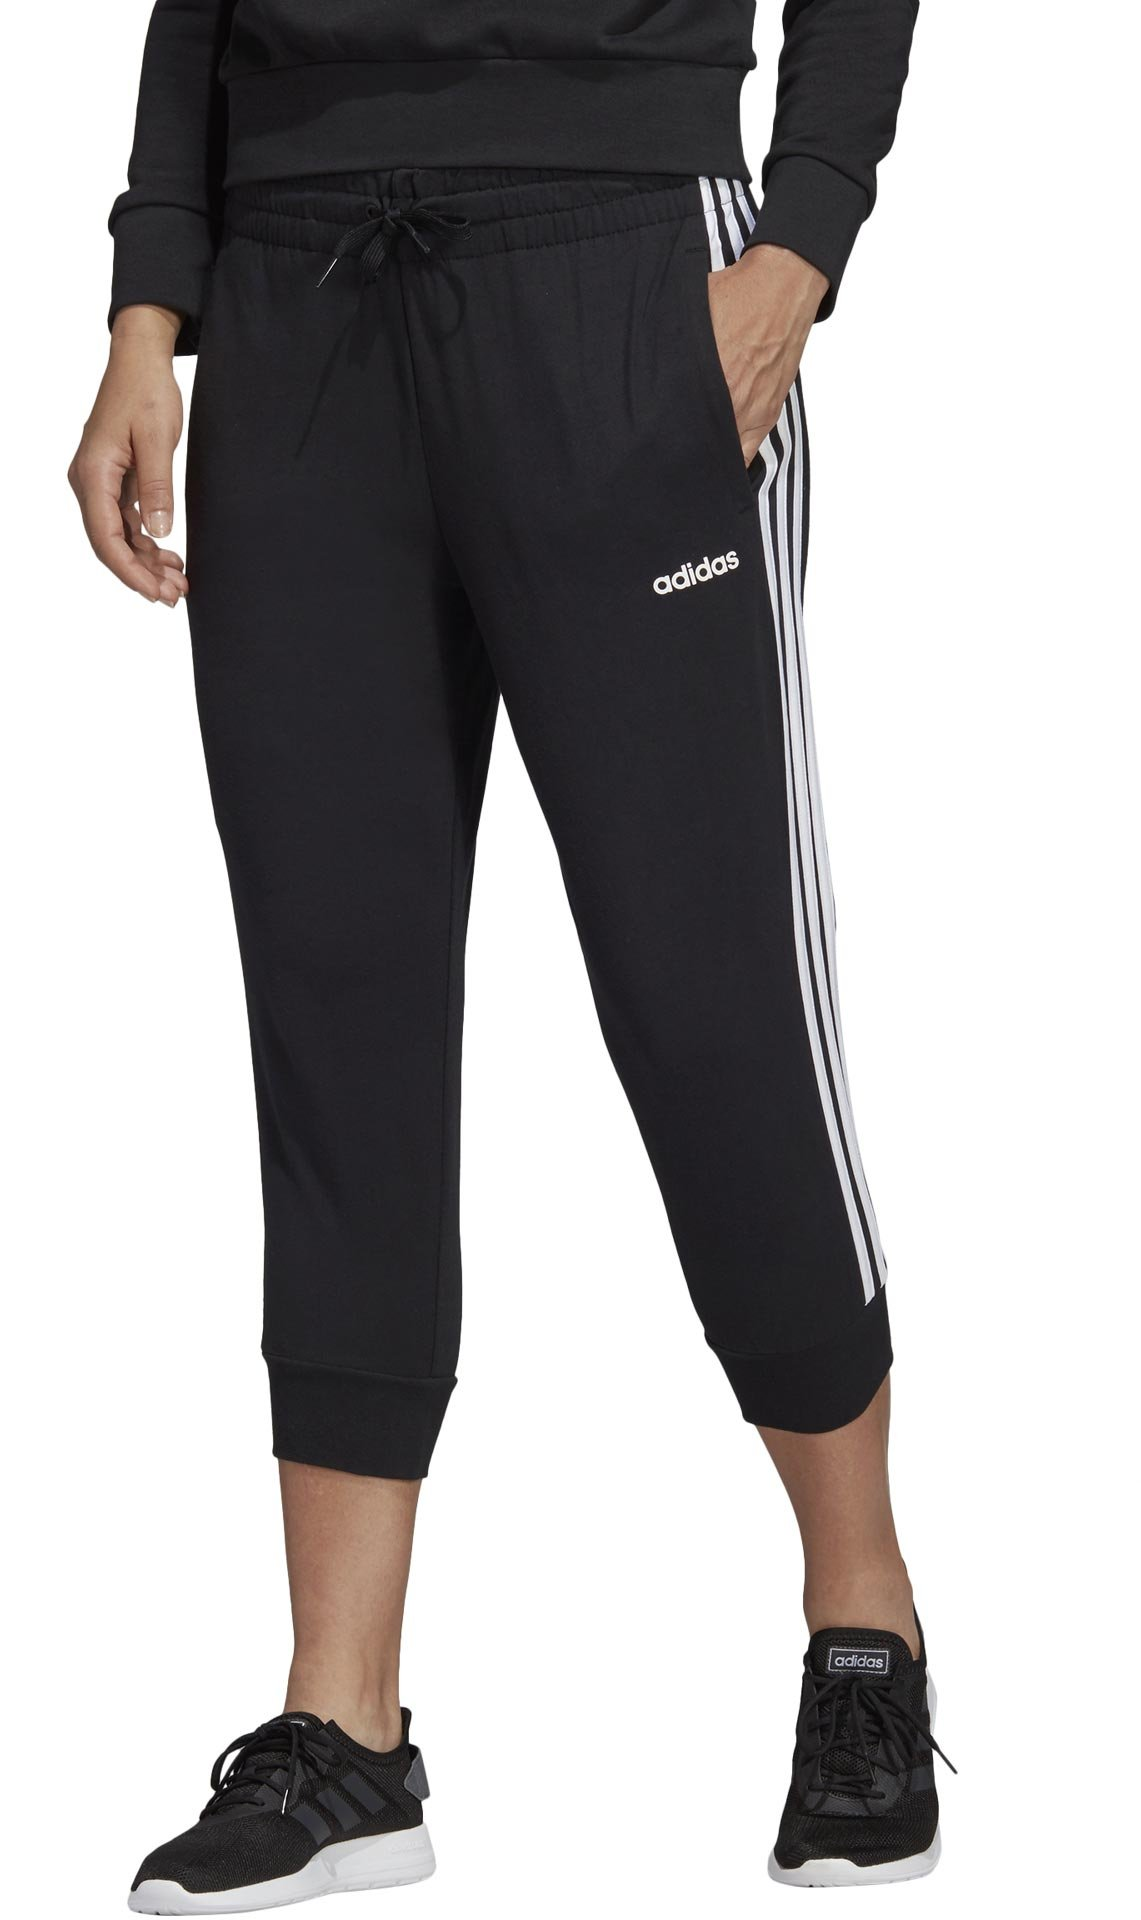 adidas Essentials 3S 3/4 Pant Single Jersey M